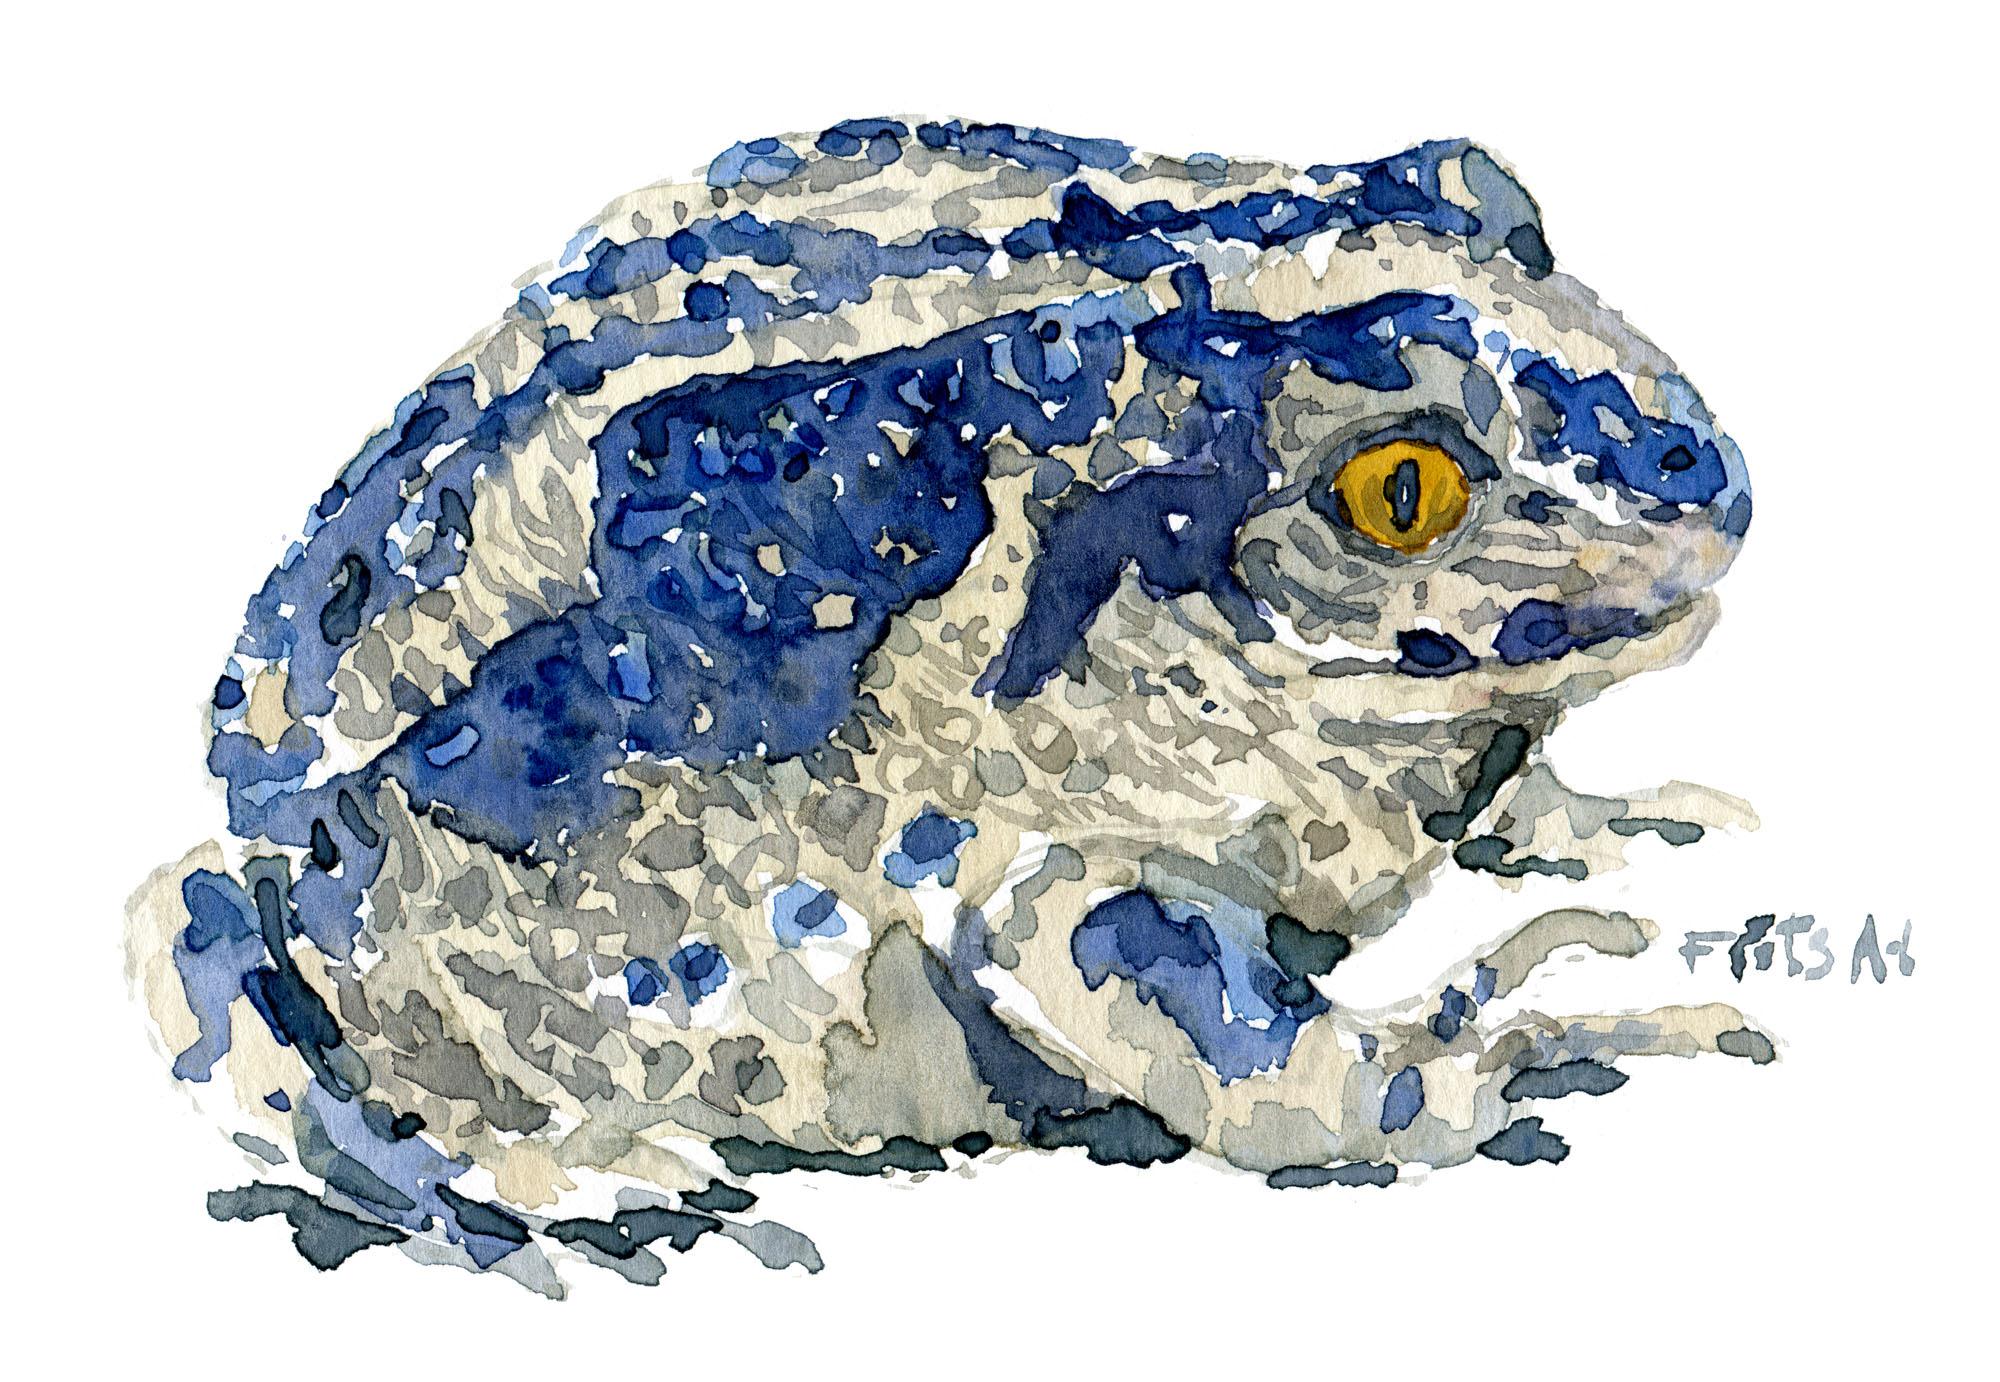 Akvarel af Løgfrø